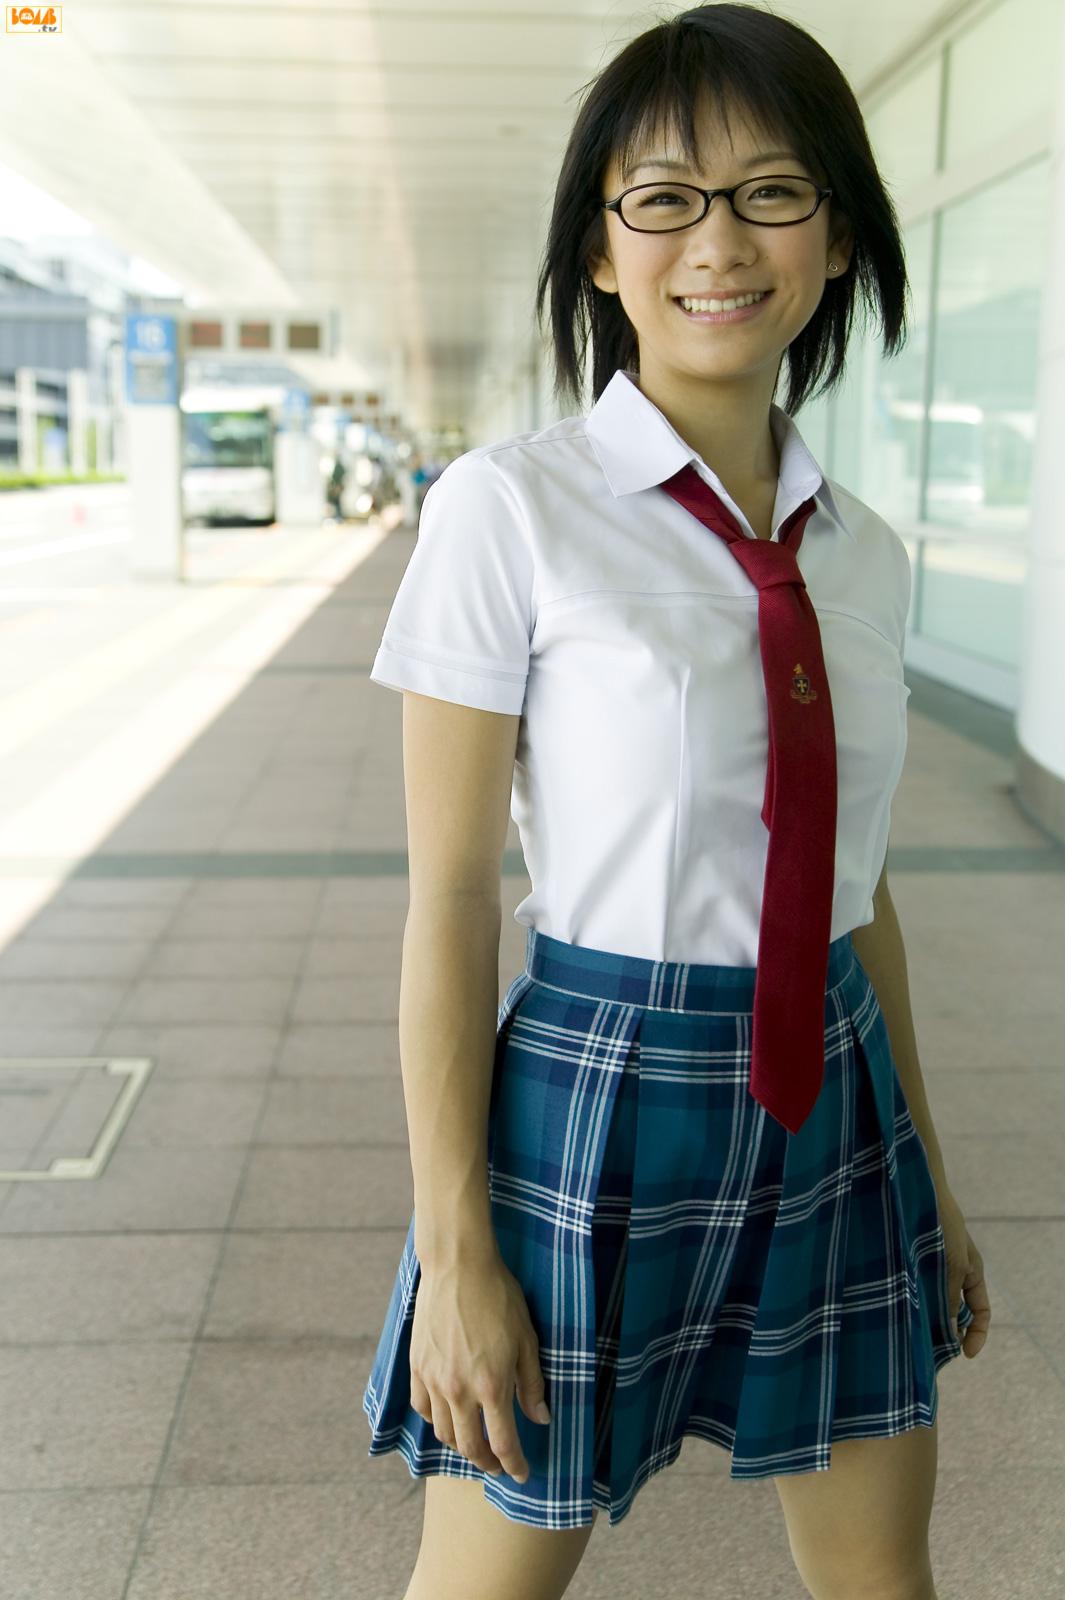 Фото японка униформа 19 фотография